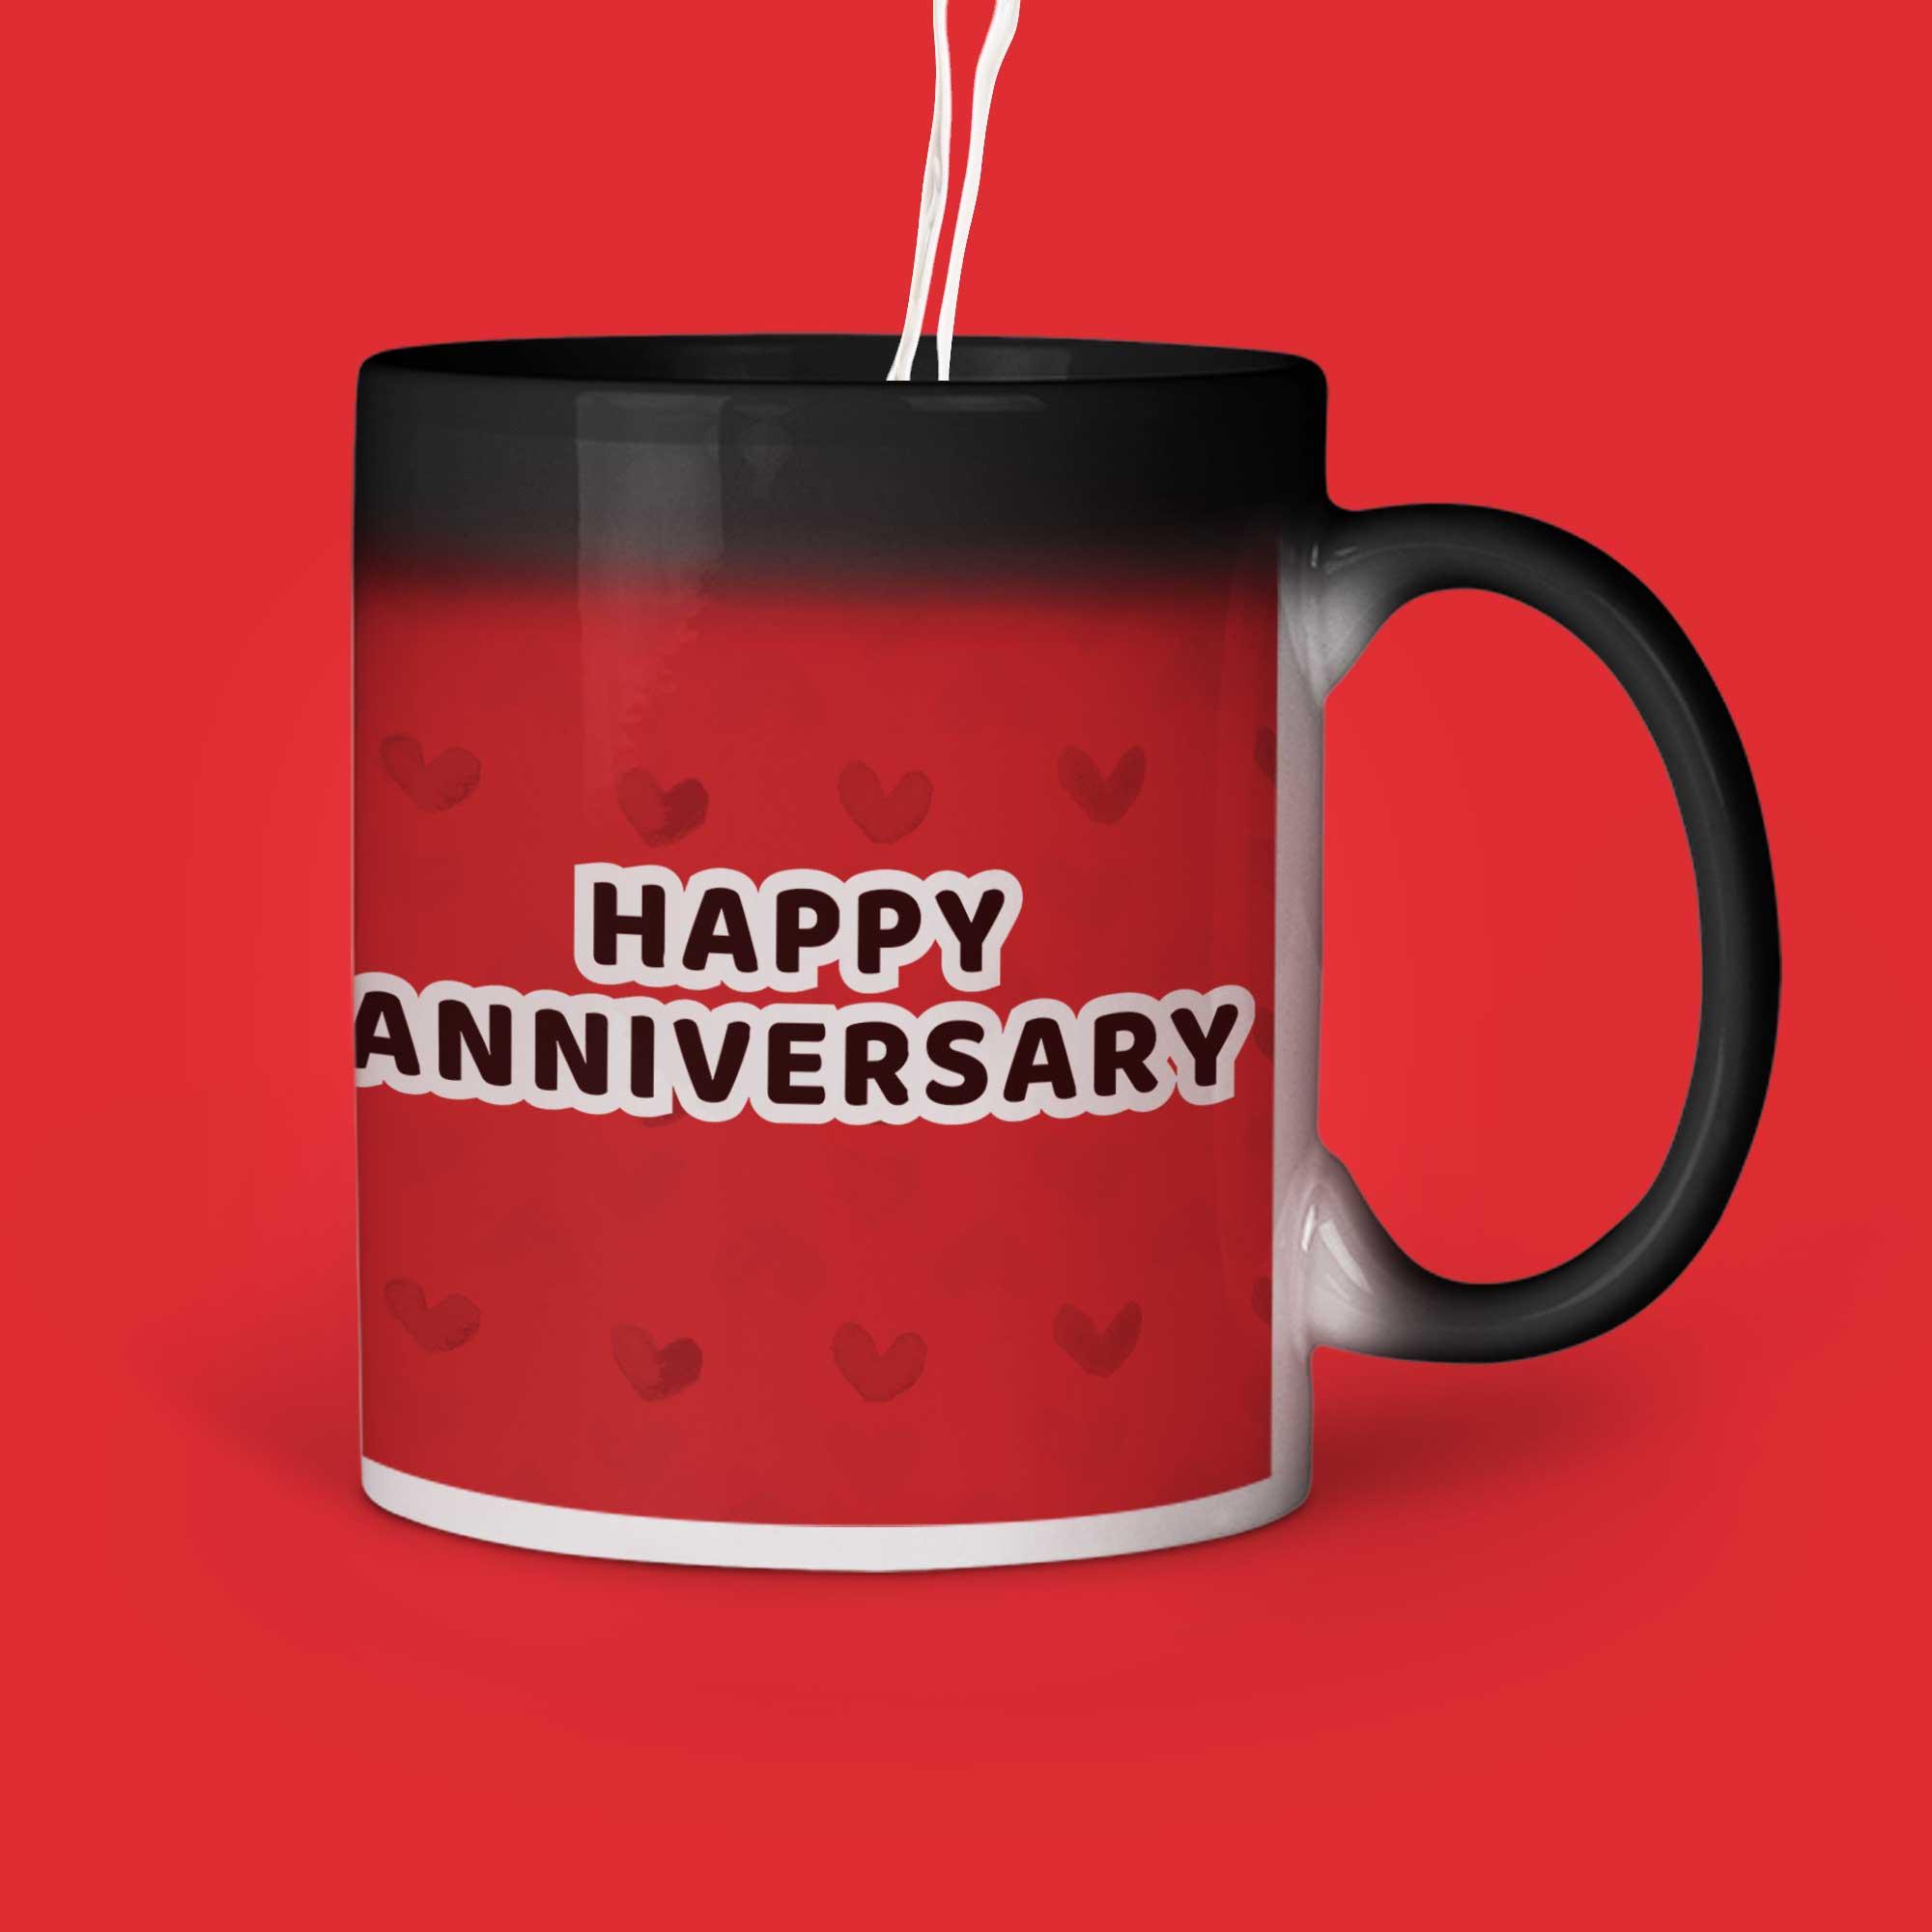 Happy Anniversary Personalized Magic Mug Right Side